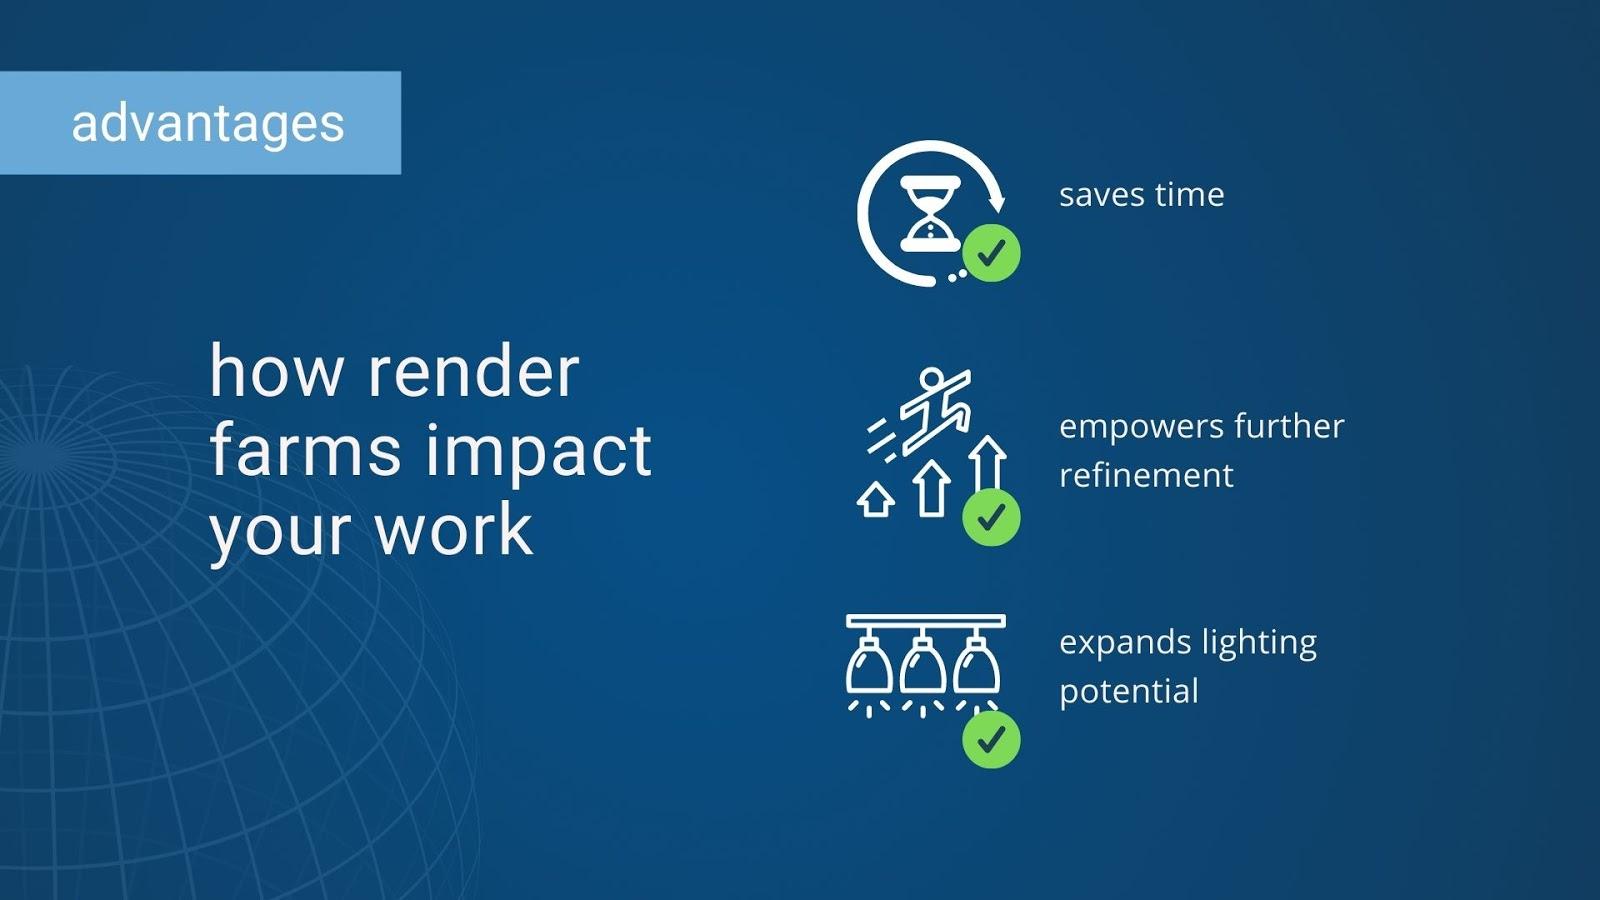 Benefits of render farm